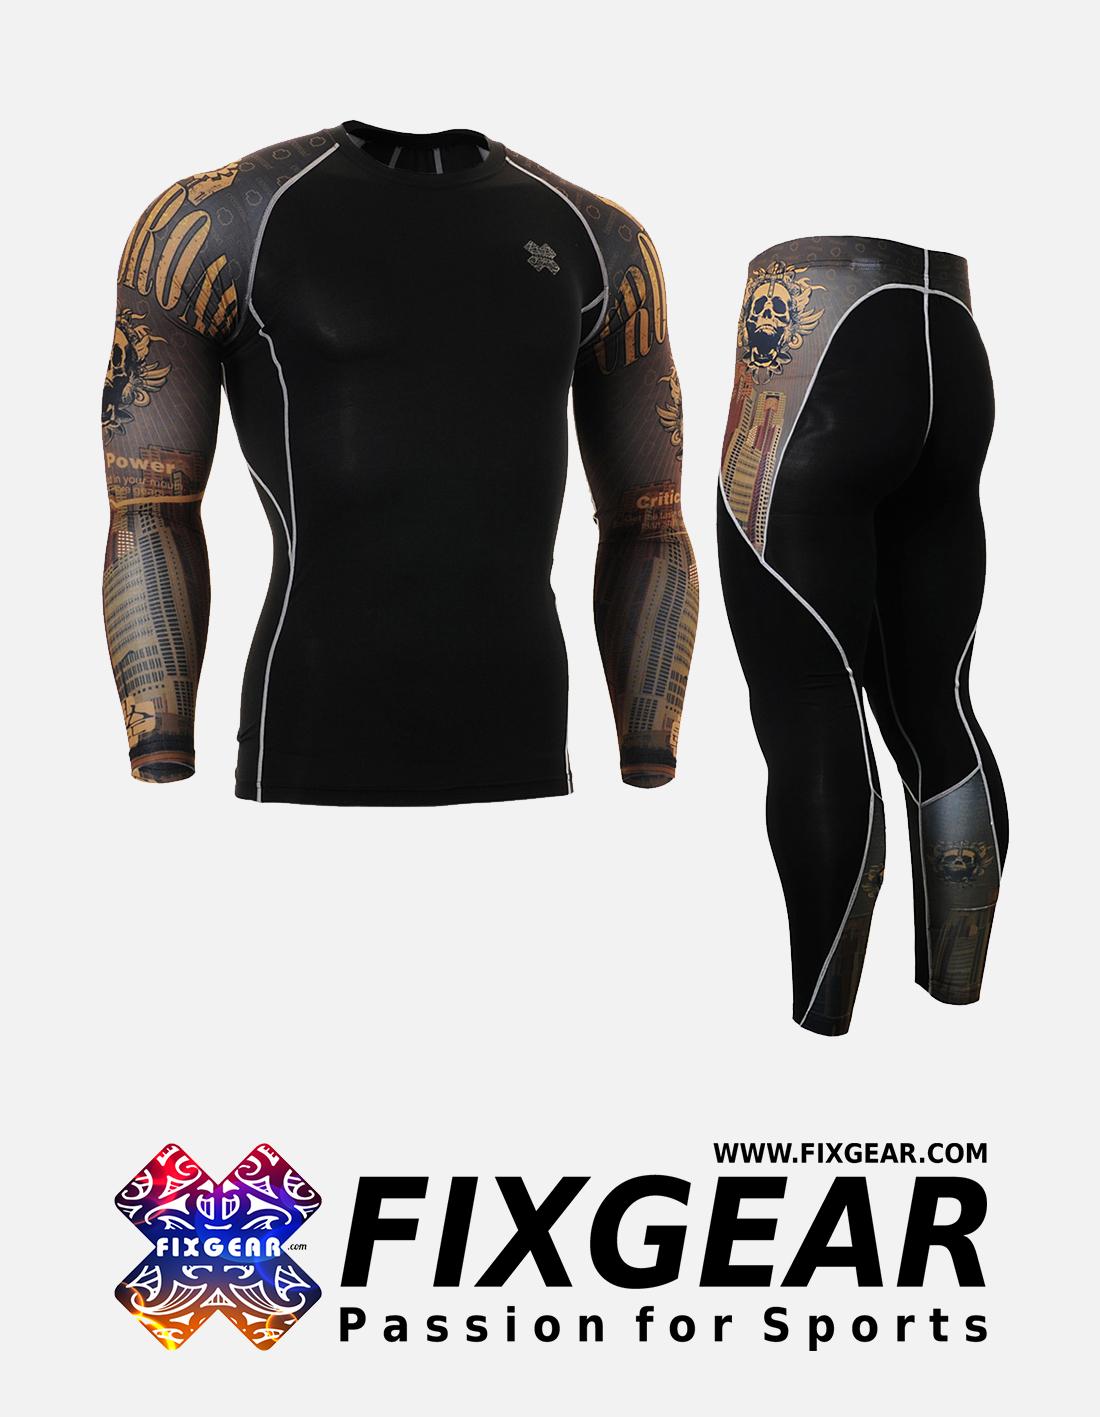 FIXGEAR CPD-P2L-B27 Set Compression Base Layer Shirt & Legging Pants